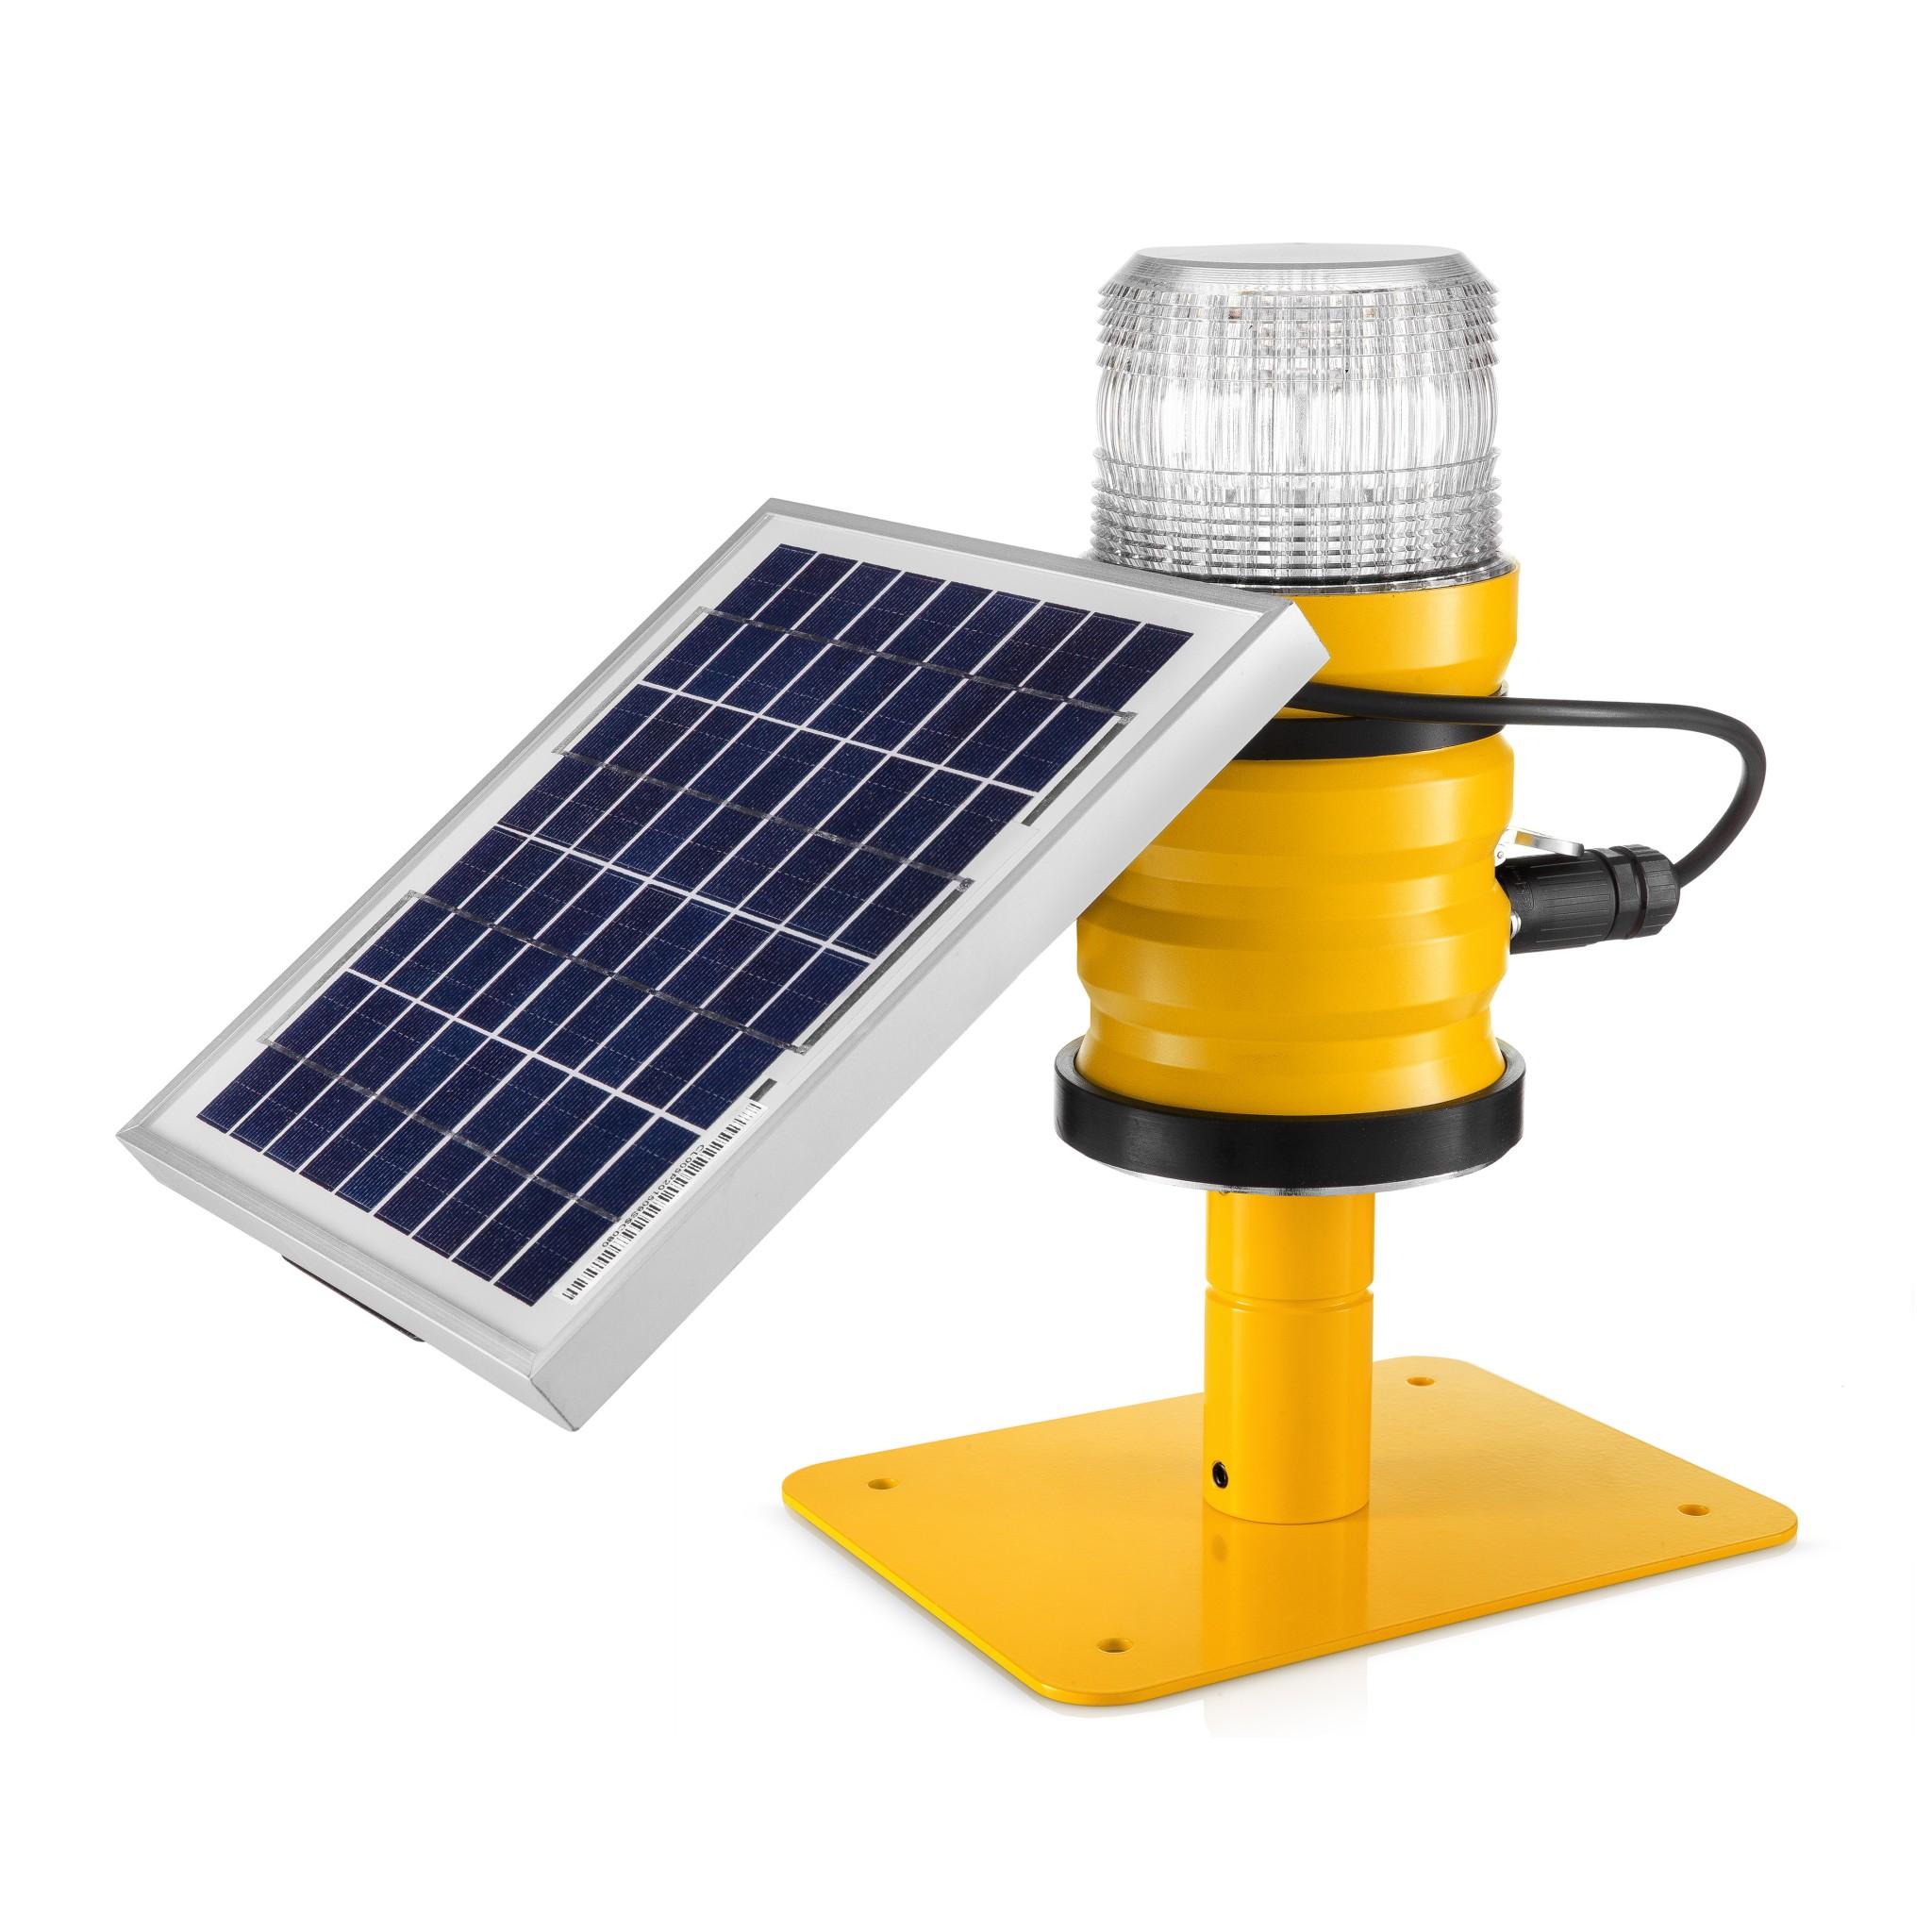 Solar Upgrade For Sp 102 Portable Light S4ga